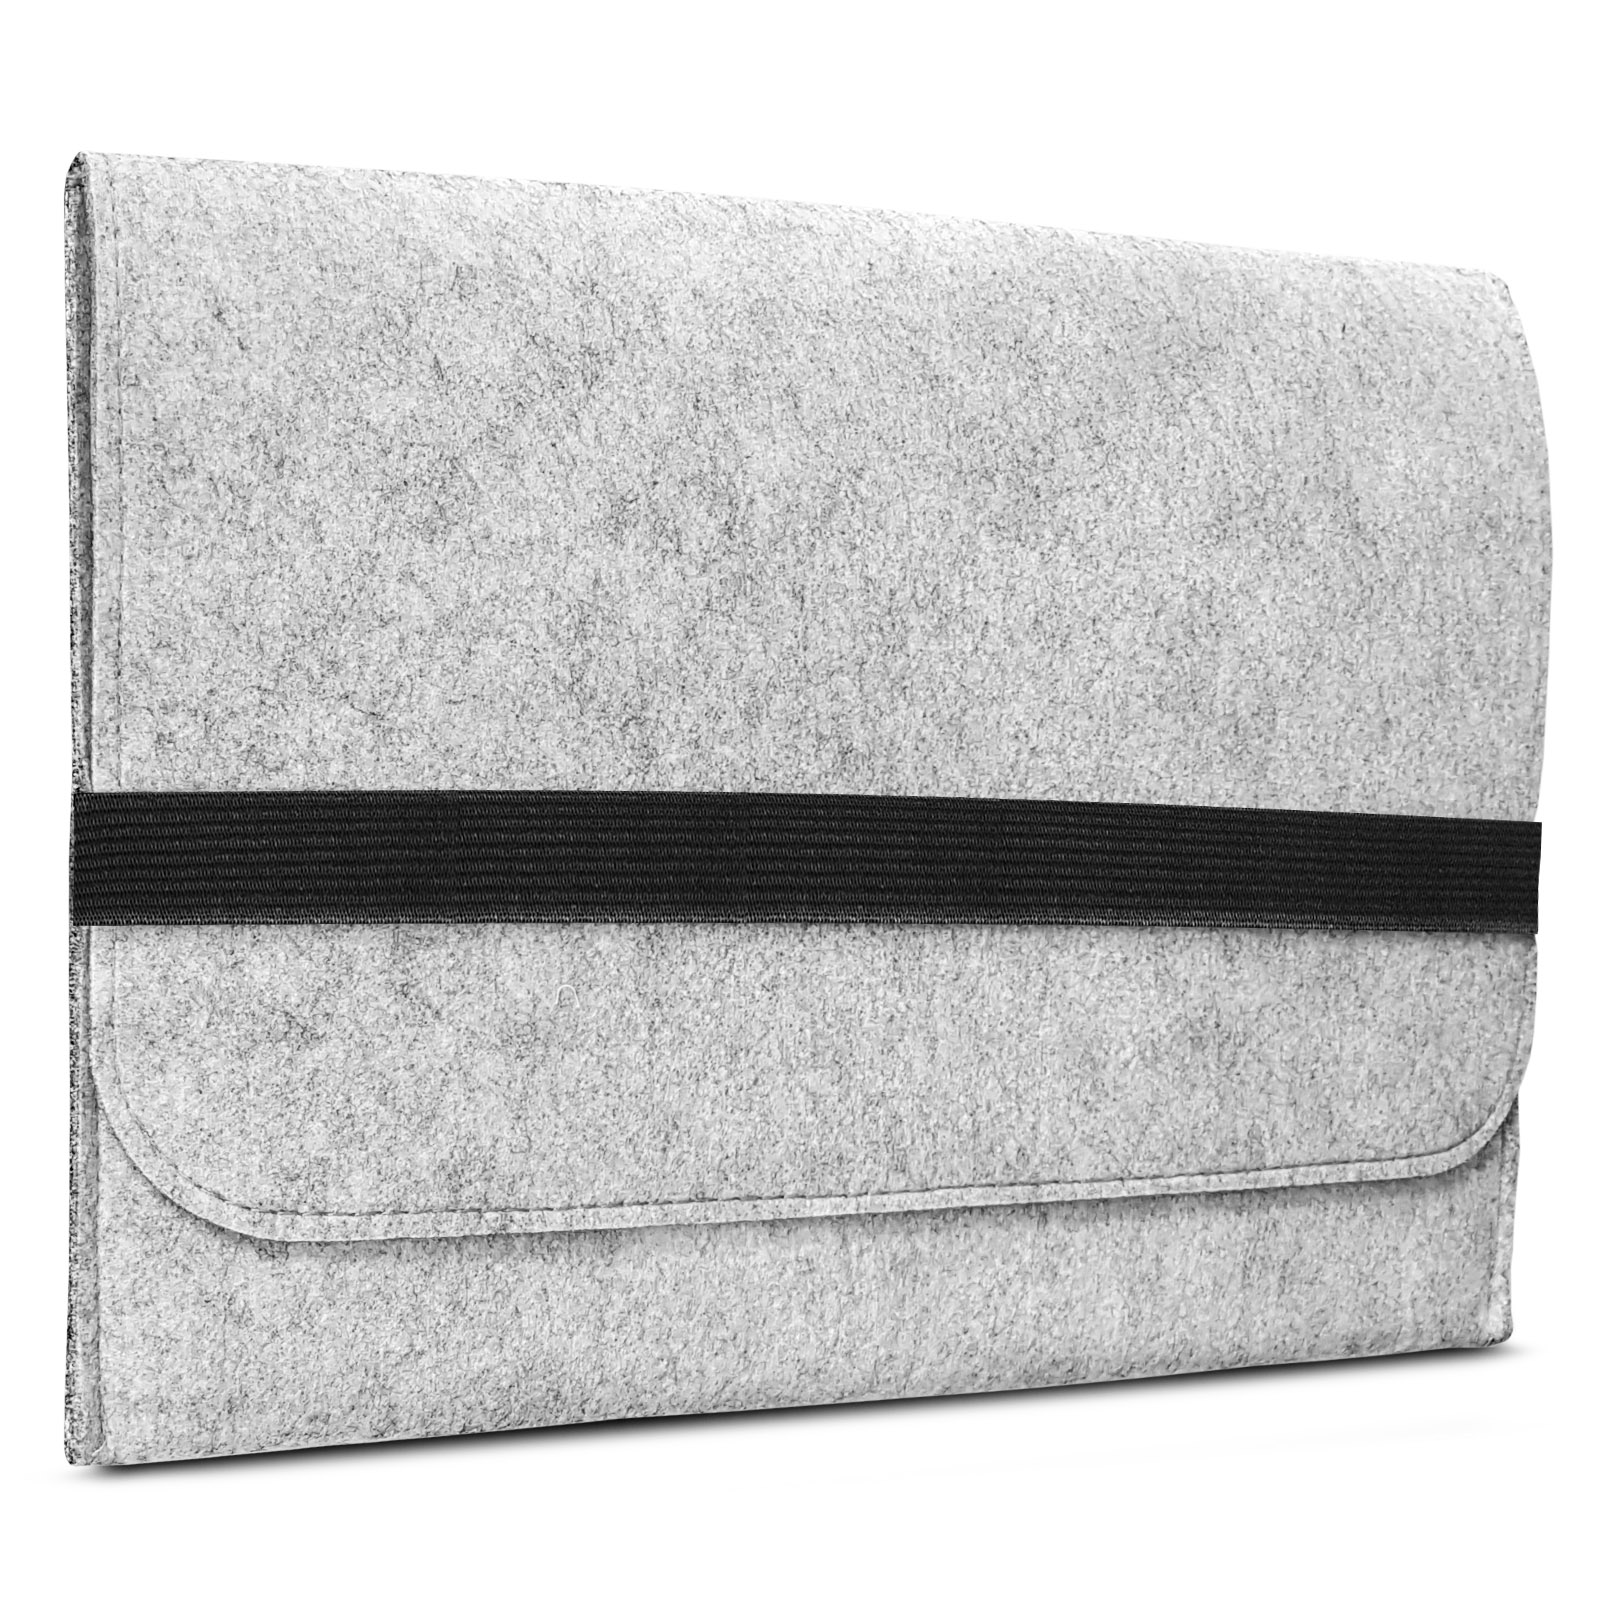 Hülle für Medion Akoya Akoya E4272 Tasche Filz Sleeve Schutzhülle Notebook Case